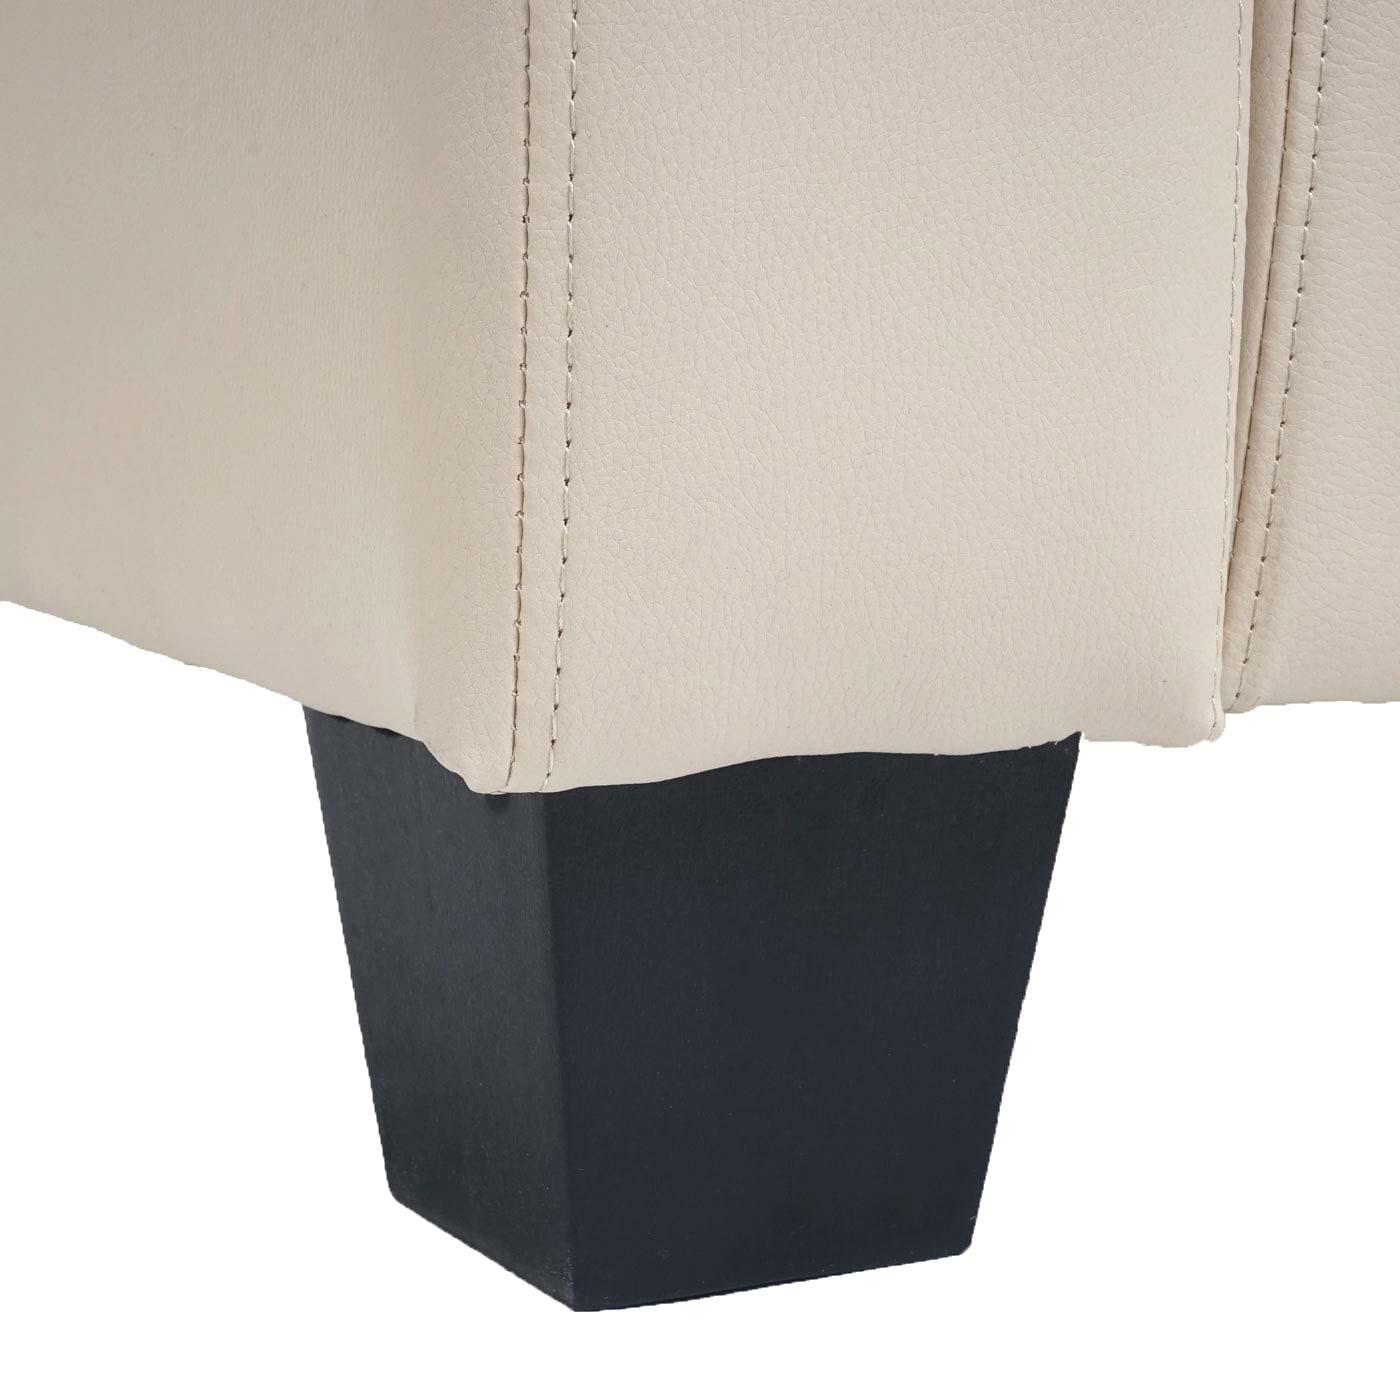 Sessel Loungesessel Lille Detailansicht Fuß